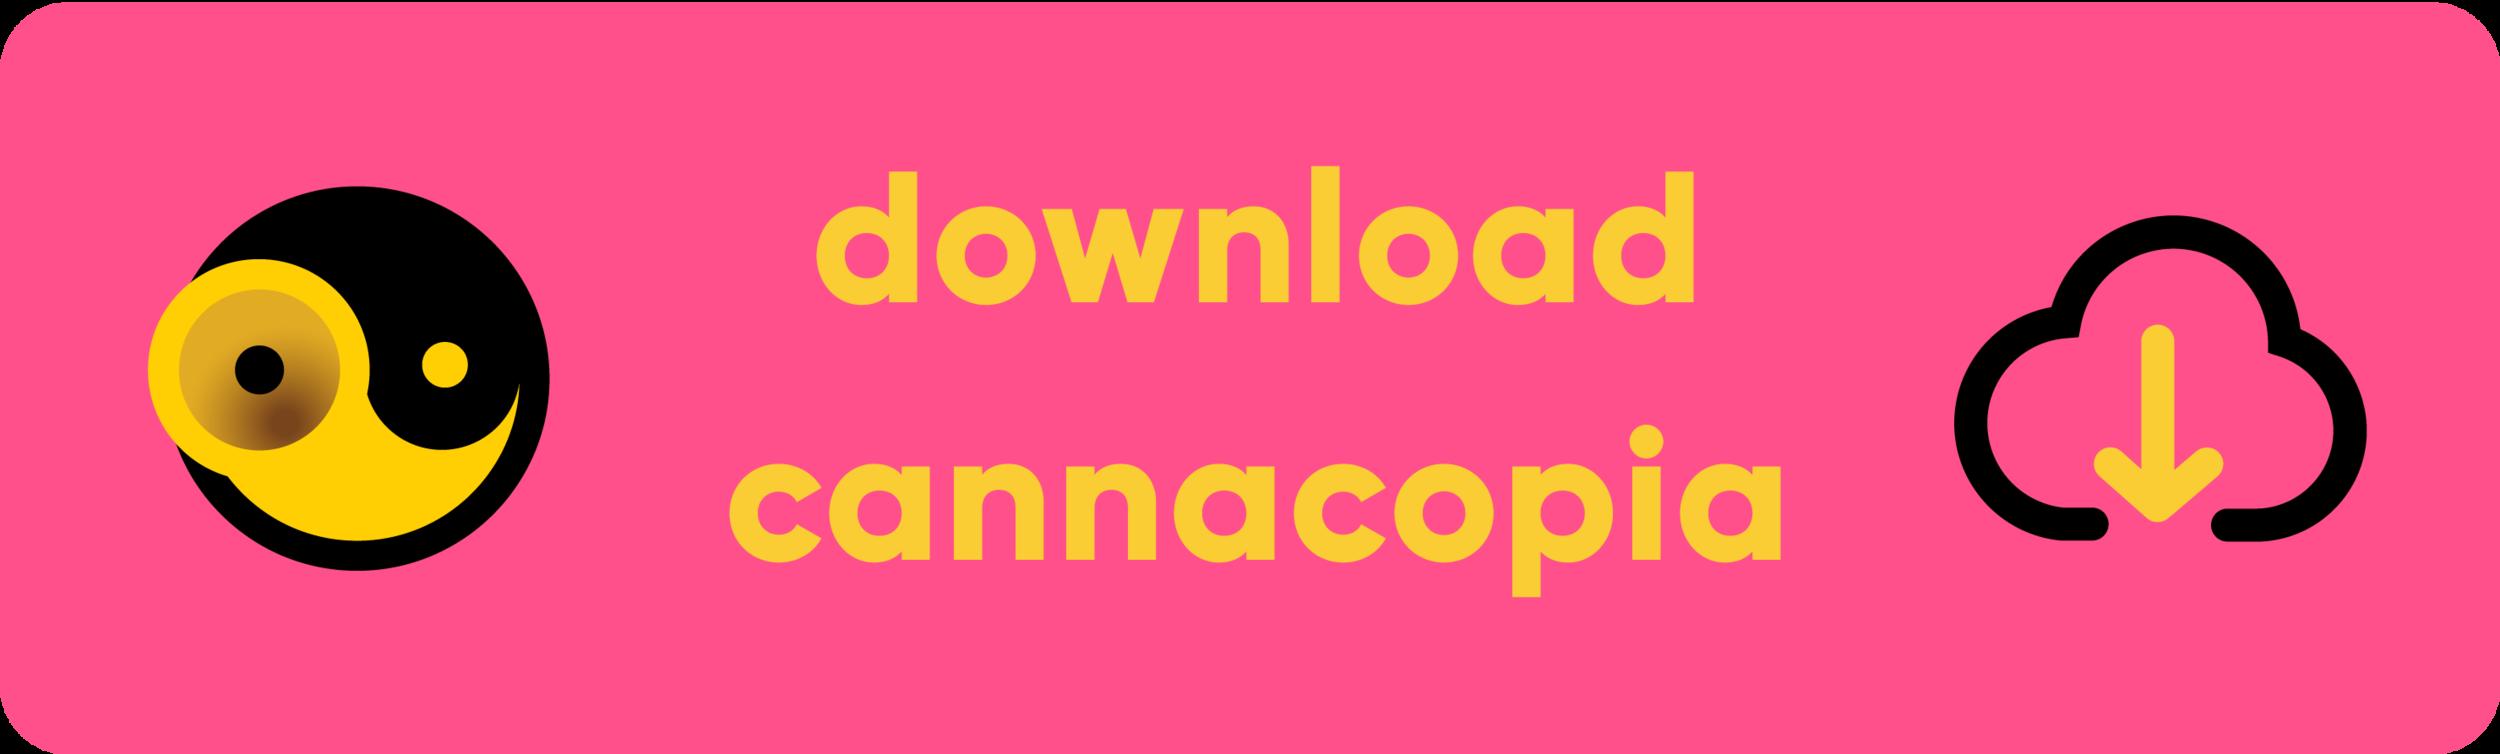 downloadcanna-05.png